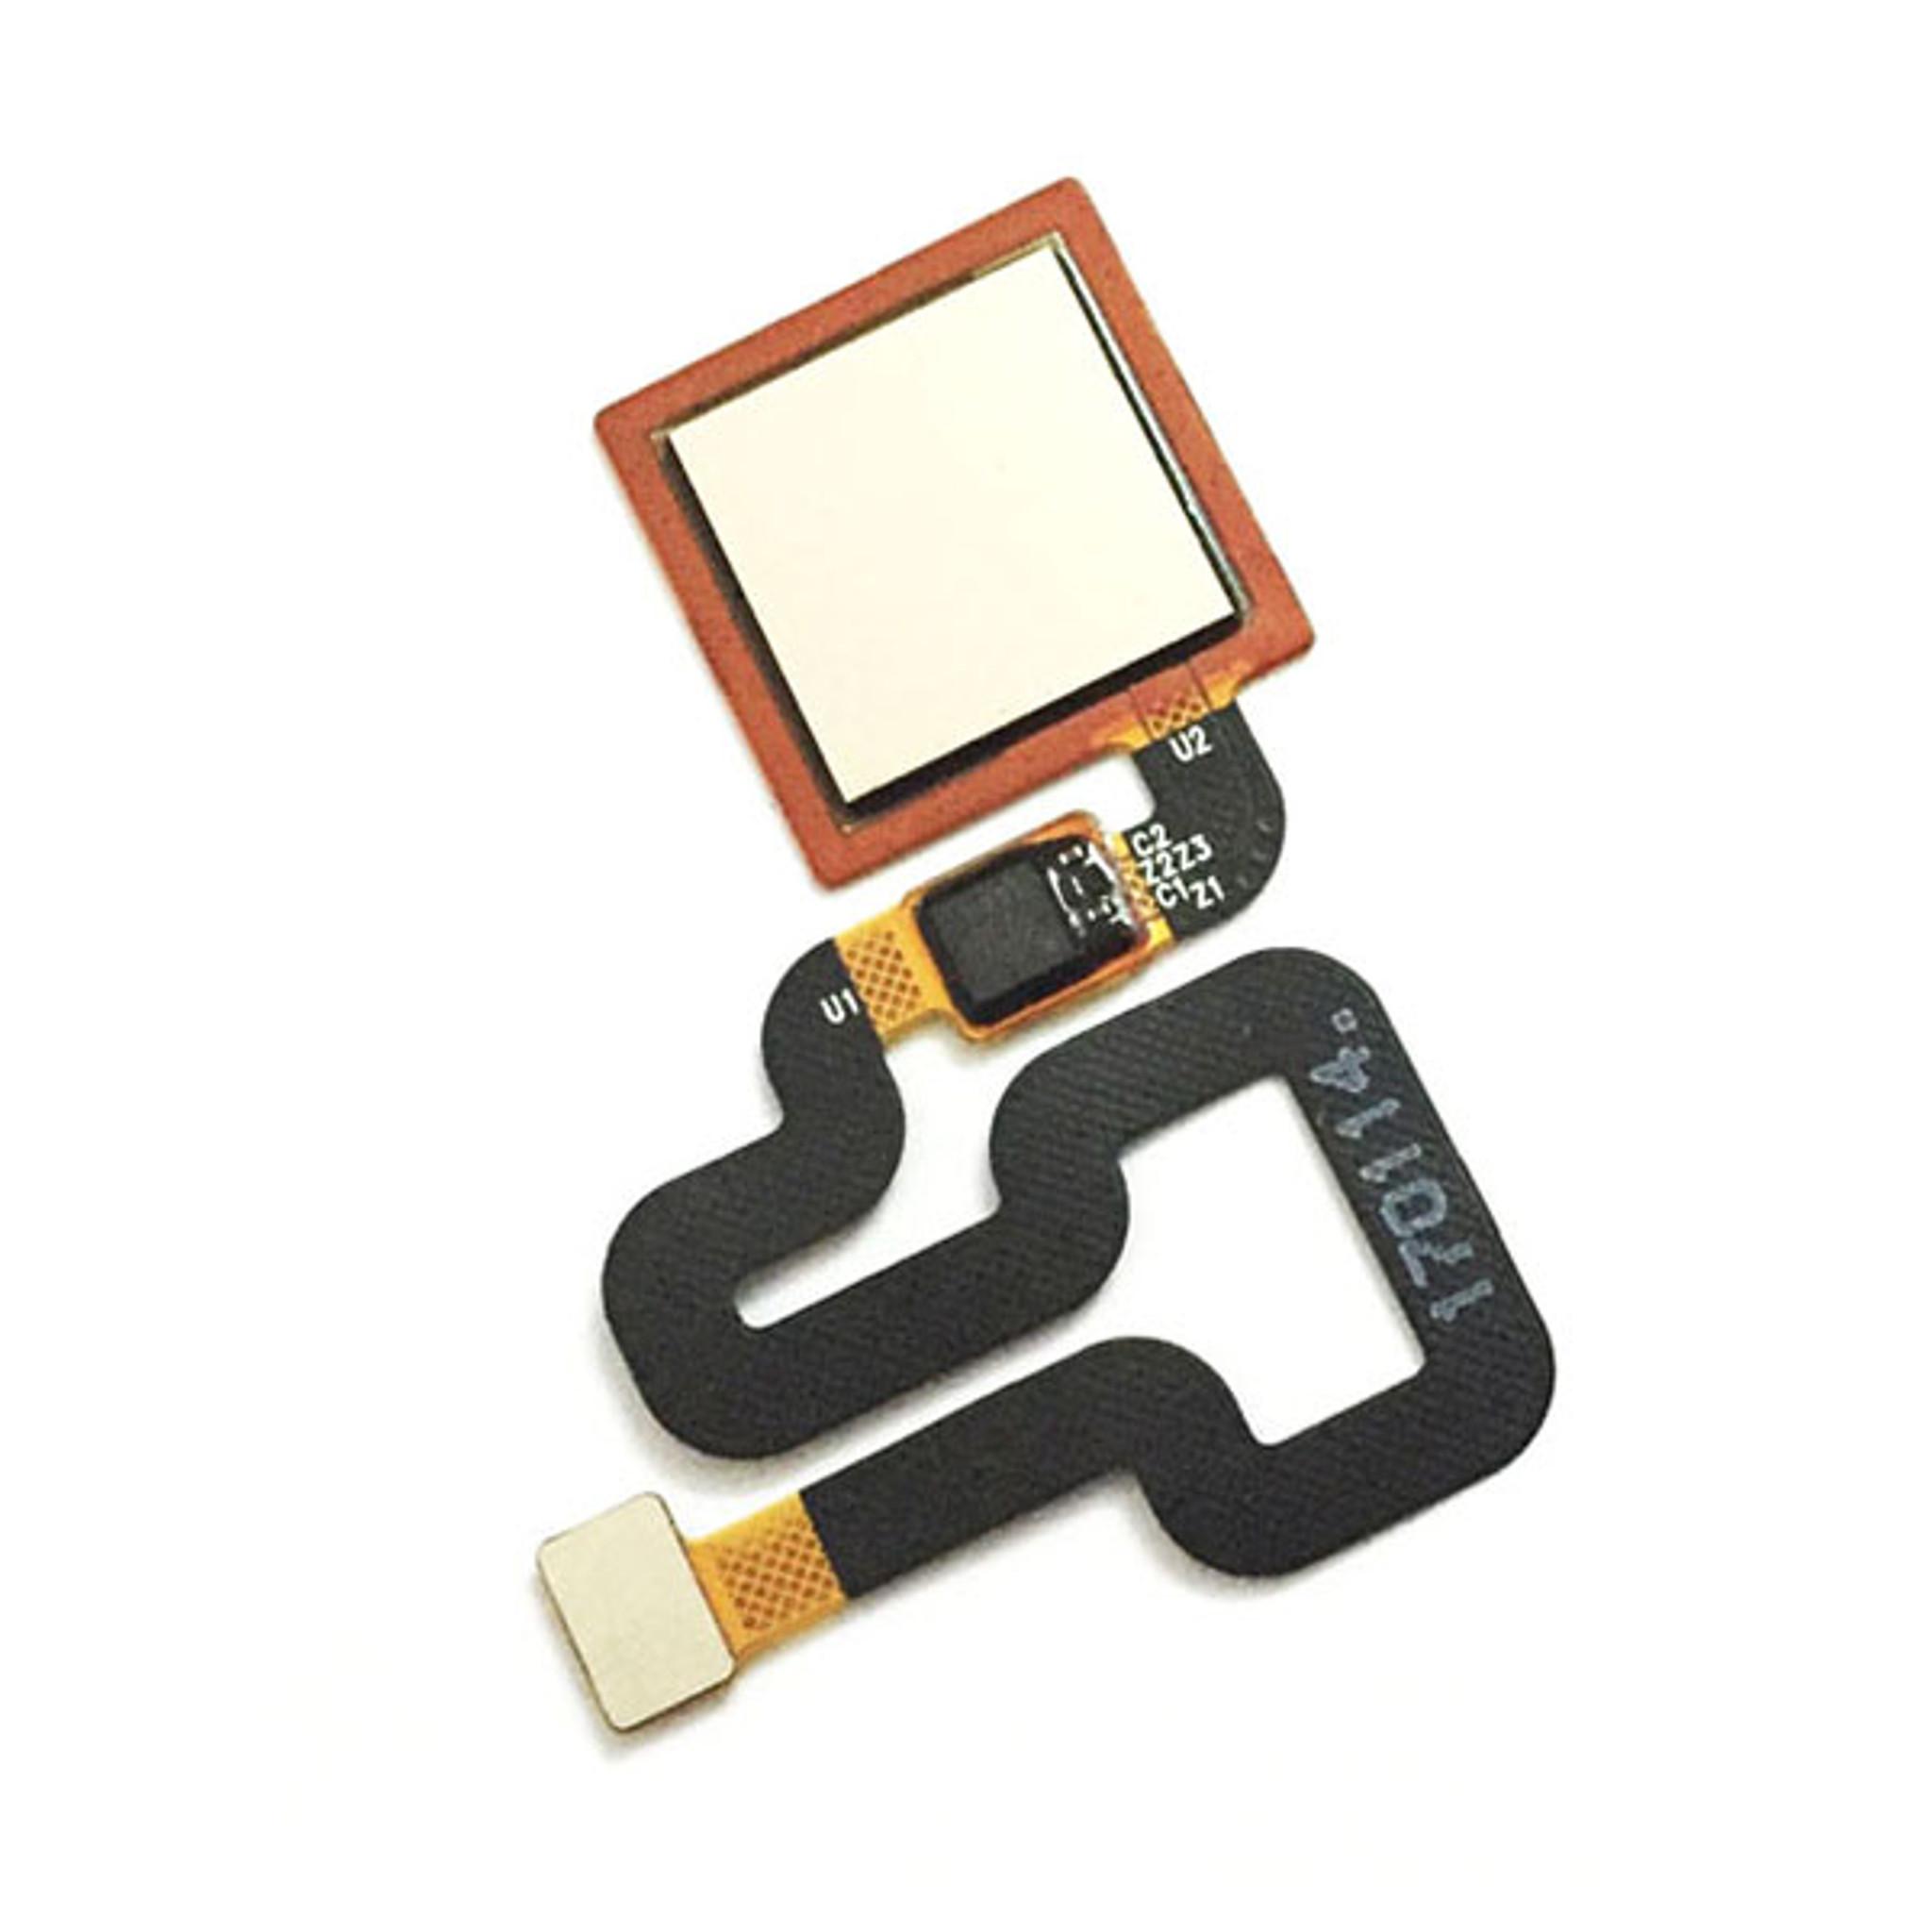 Fingerprint Sensor Flex Cable for Xiaomi Redmi 4 Prime (Redmi 4 Pro) -Gold